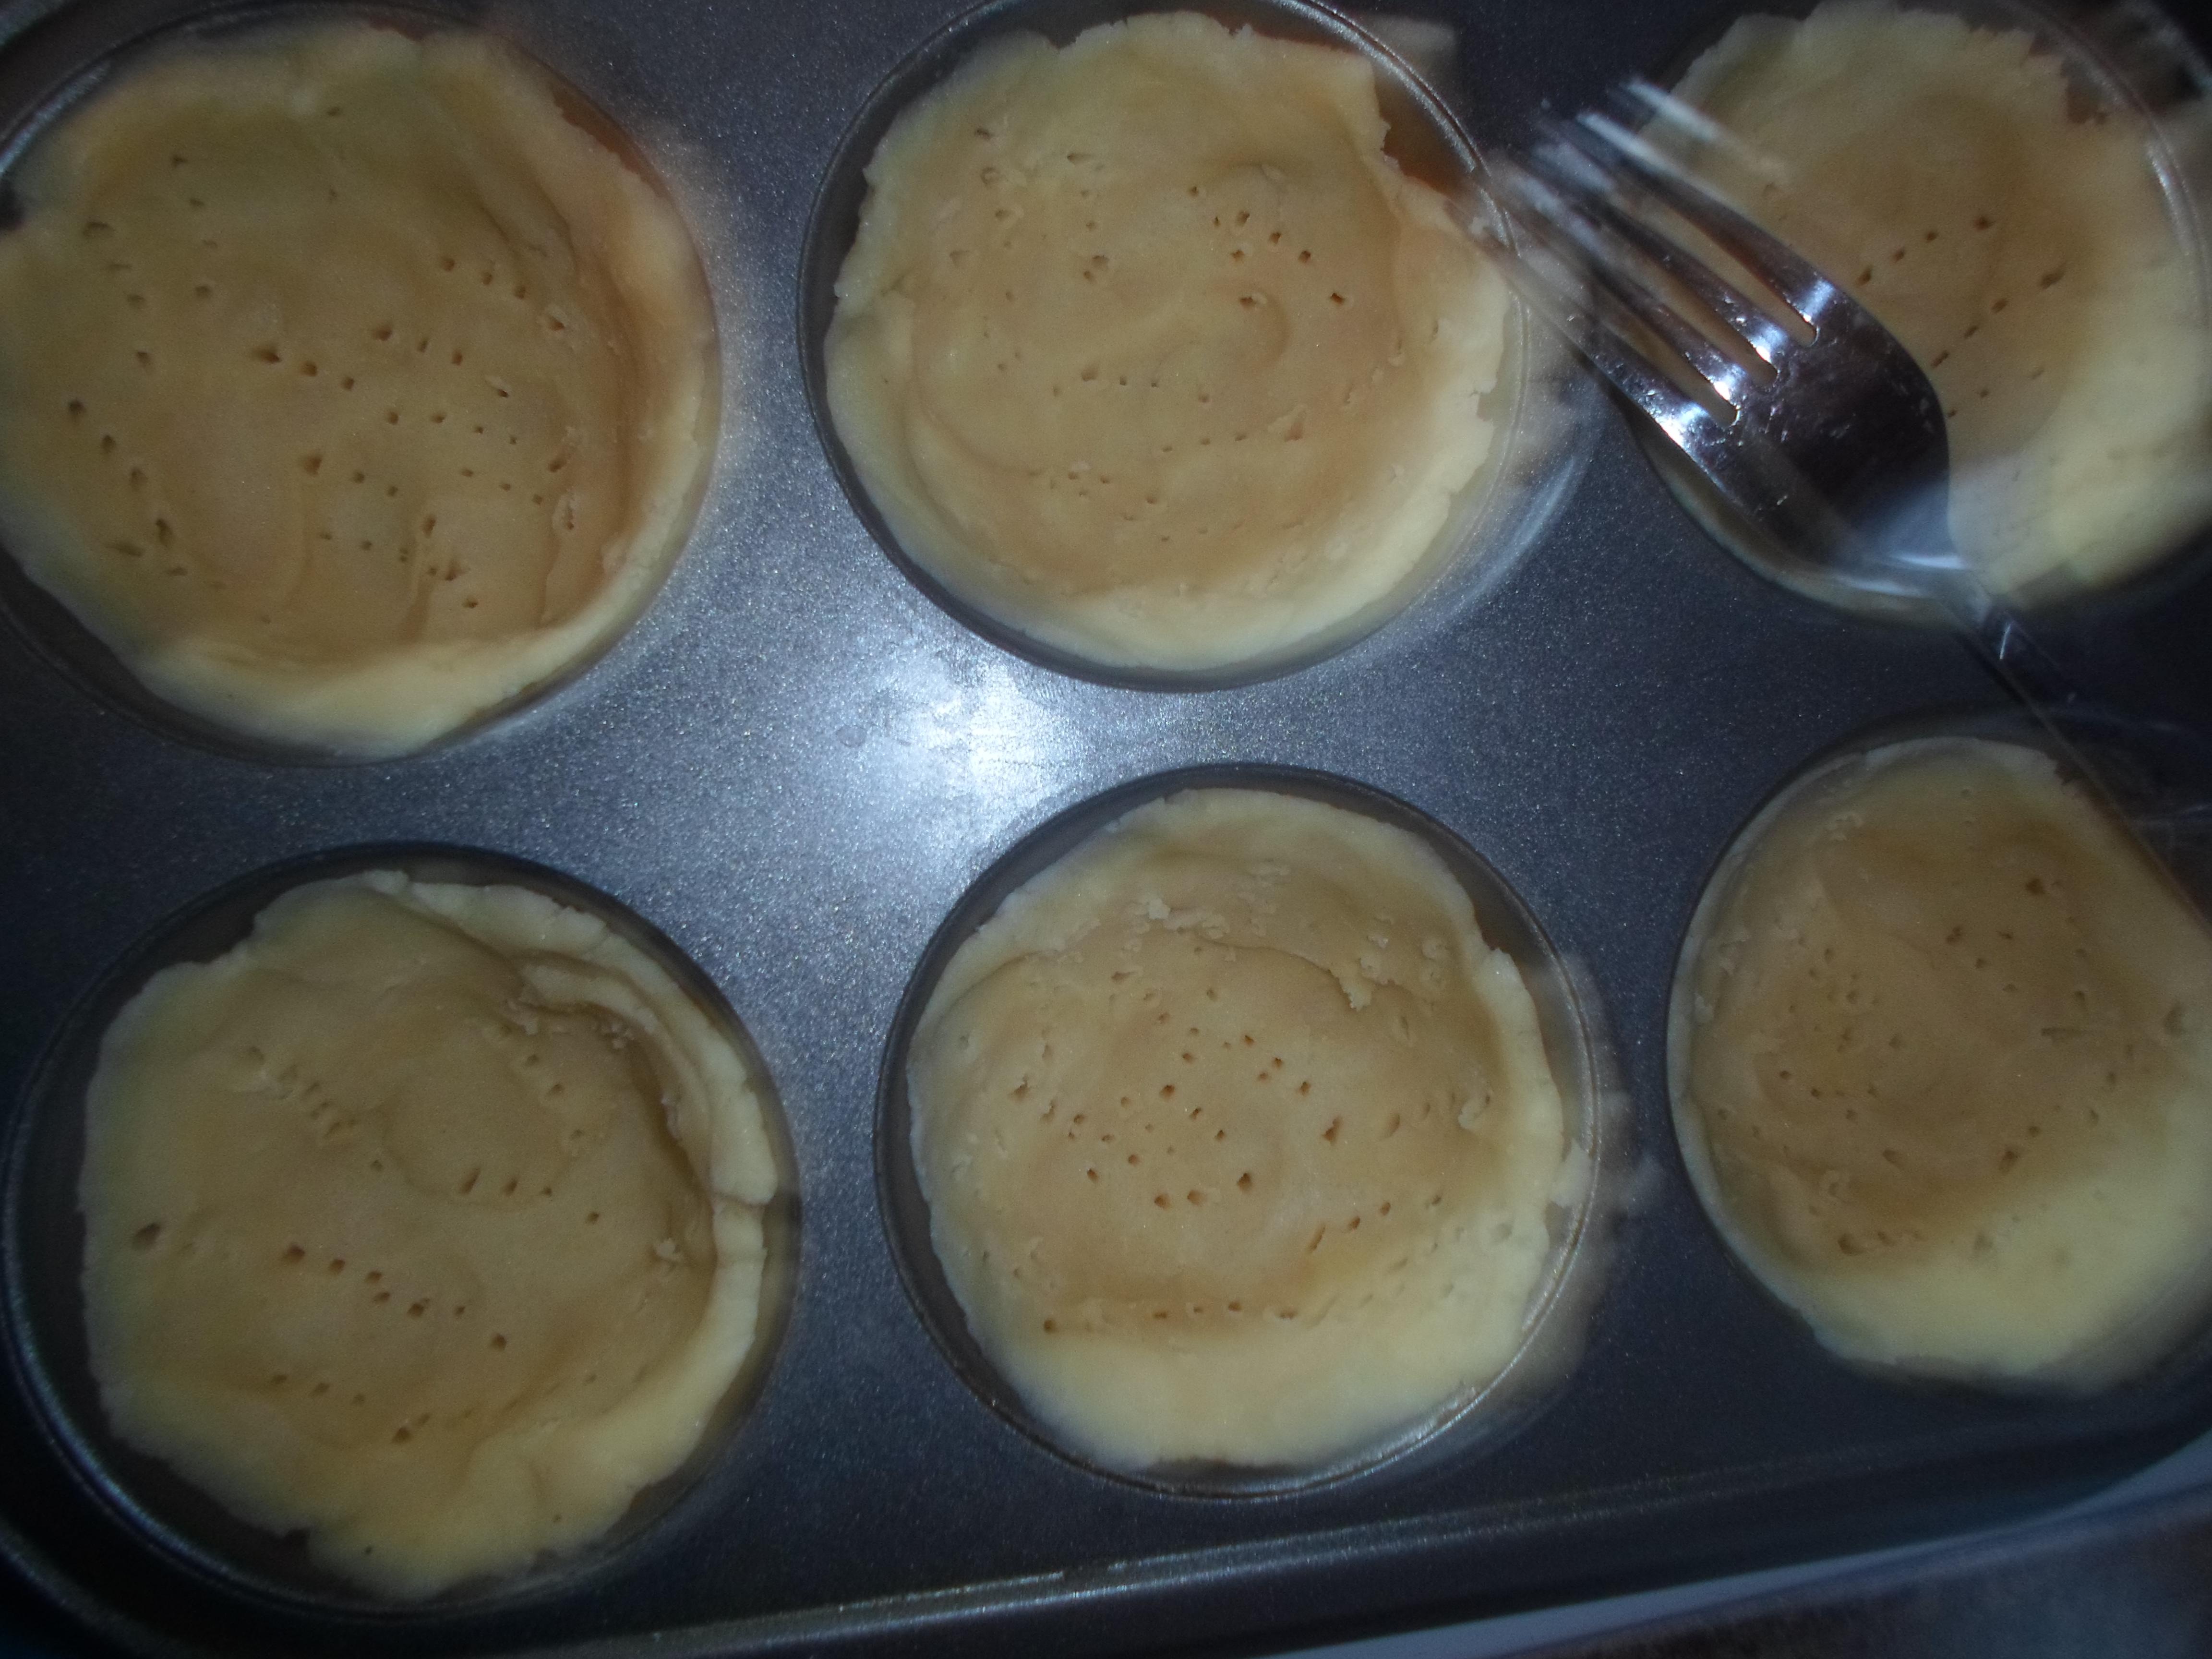 were jumbo monkey bread jumbo cupcakes the biscuits i used were jumbo ...